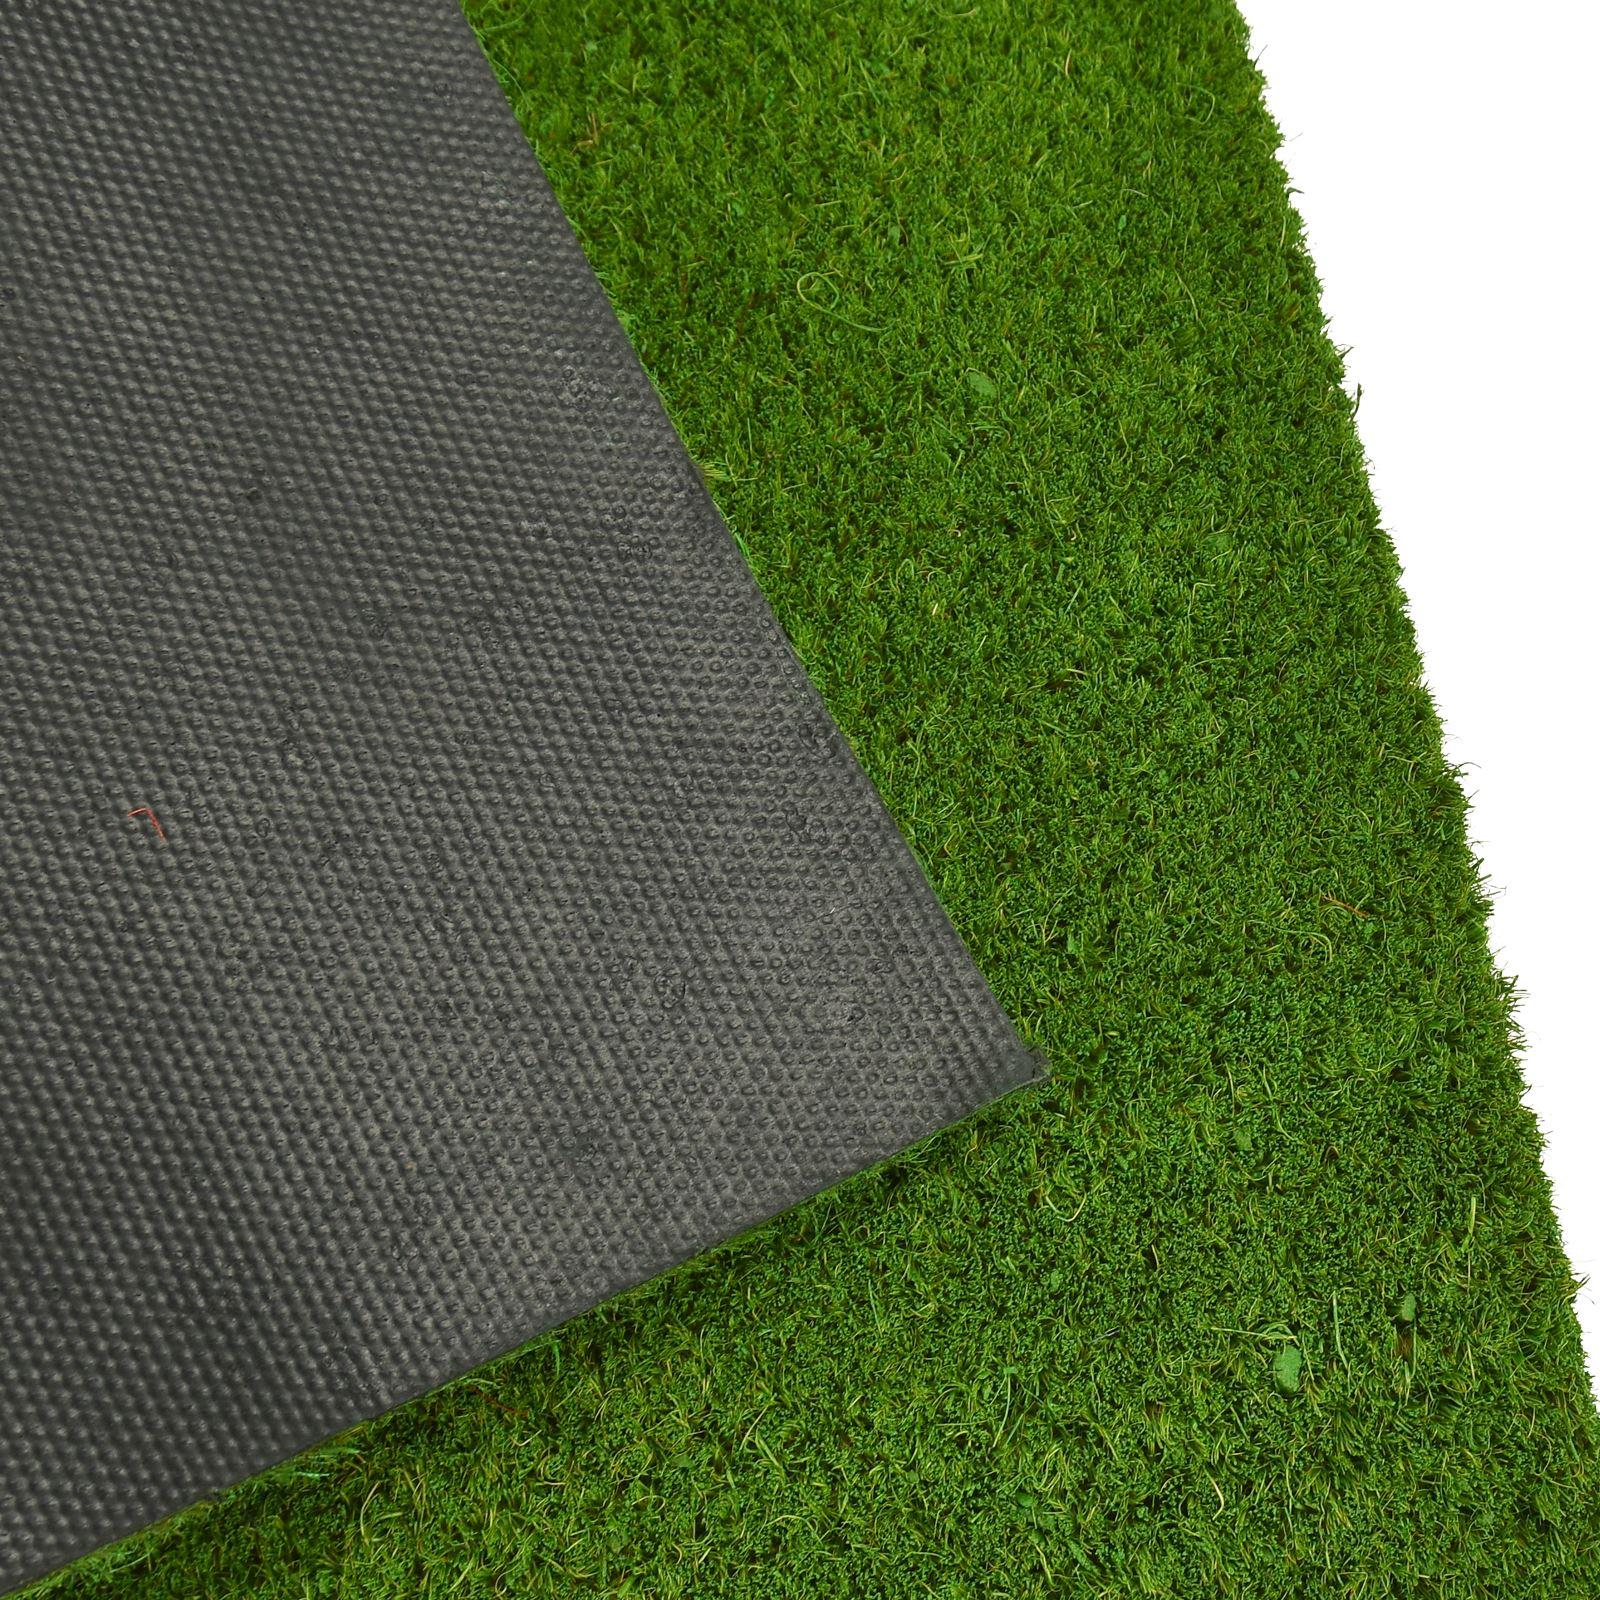 Plain-Non-Slip-Door-Mat-Tough-Natural-Coir-PVC-Back-Welcome-Doormat-40-x-60cm miniatura 66